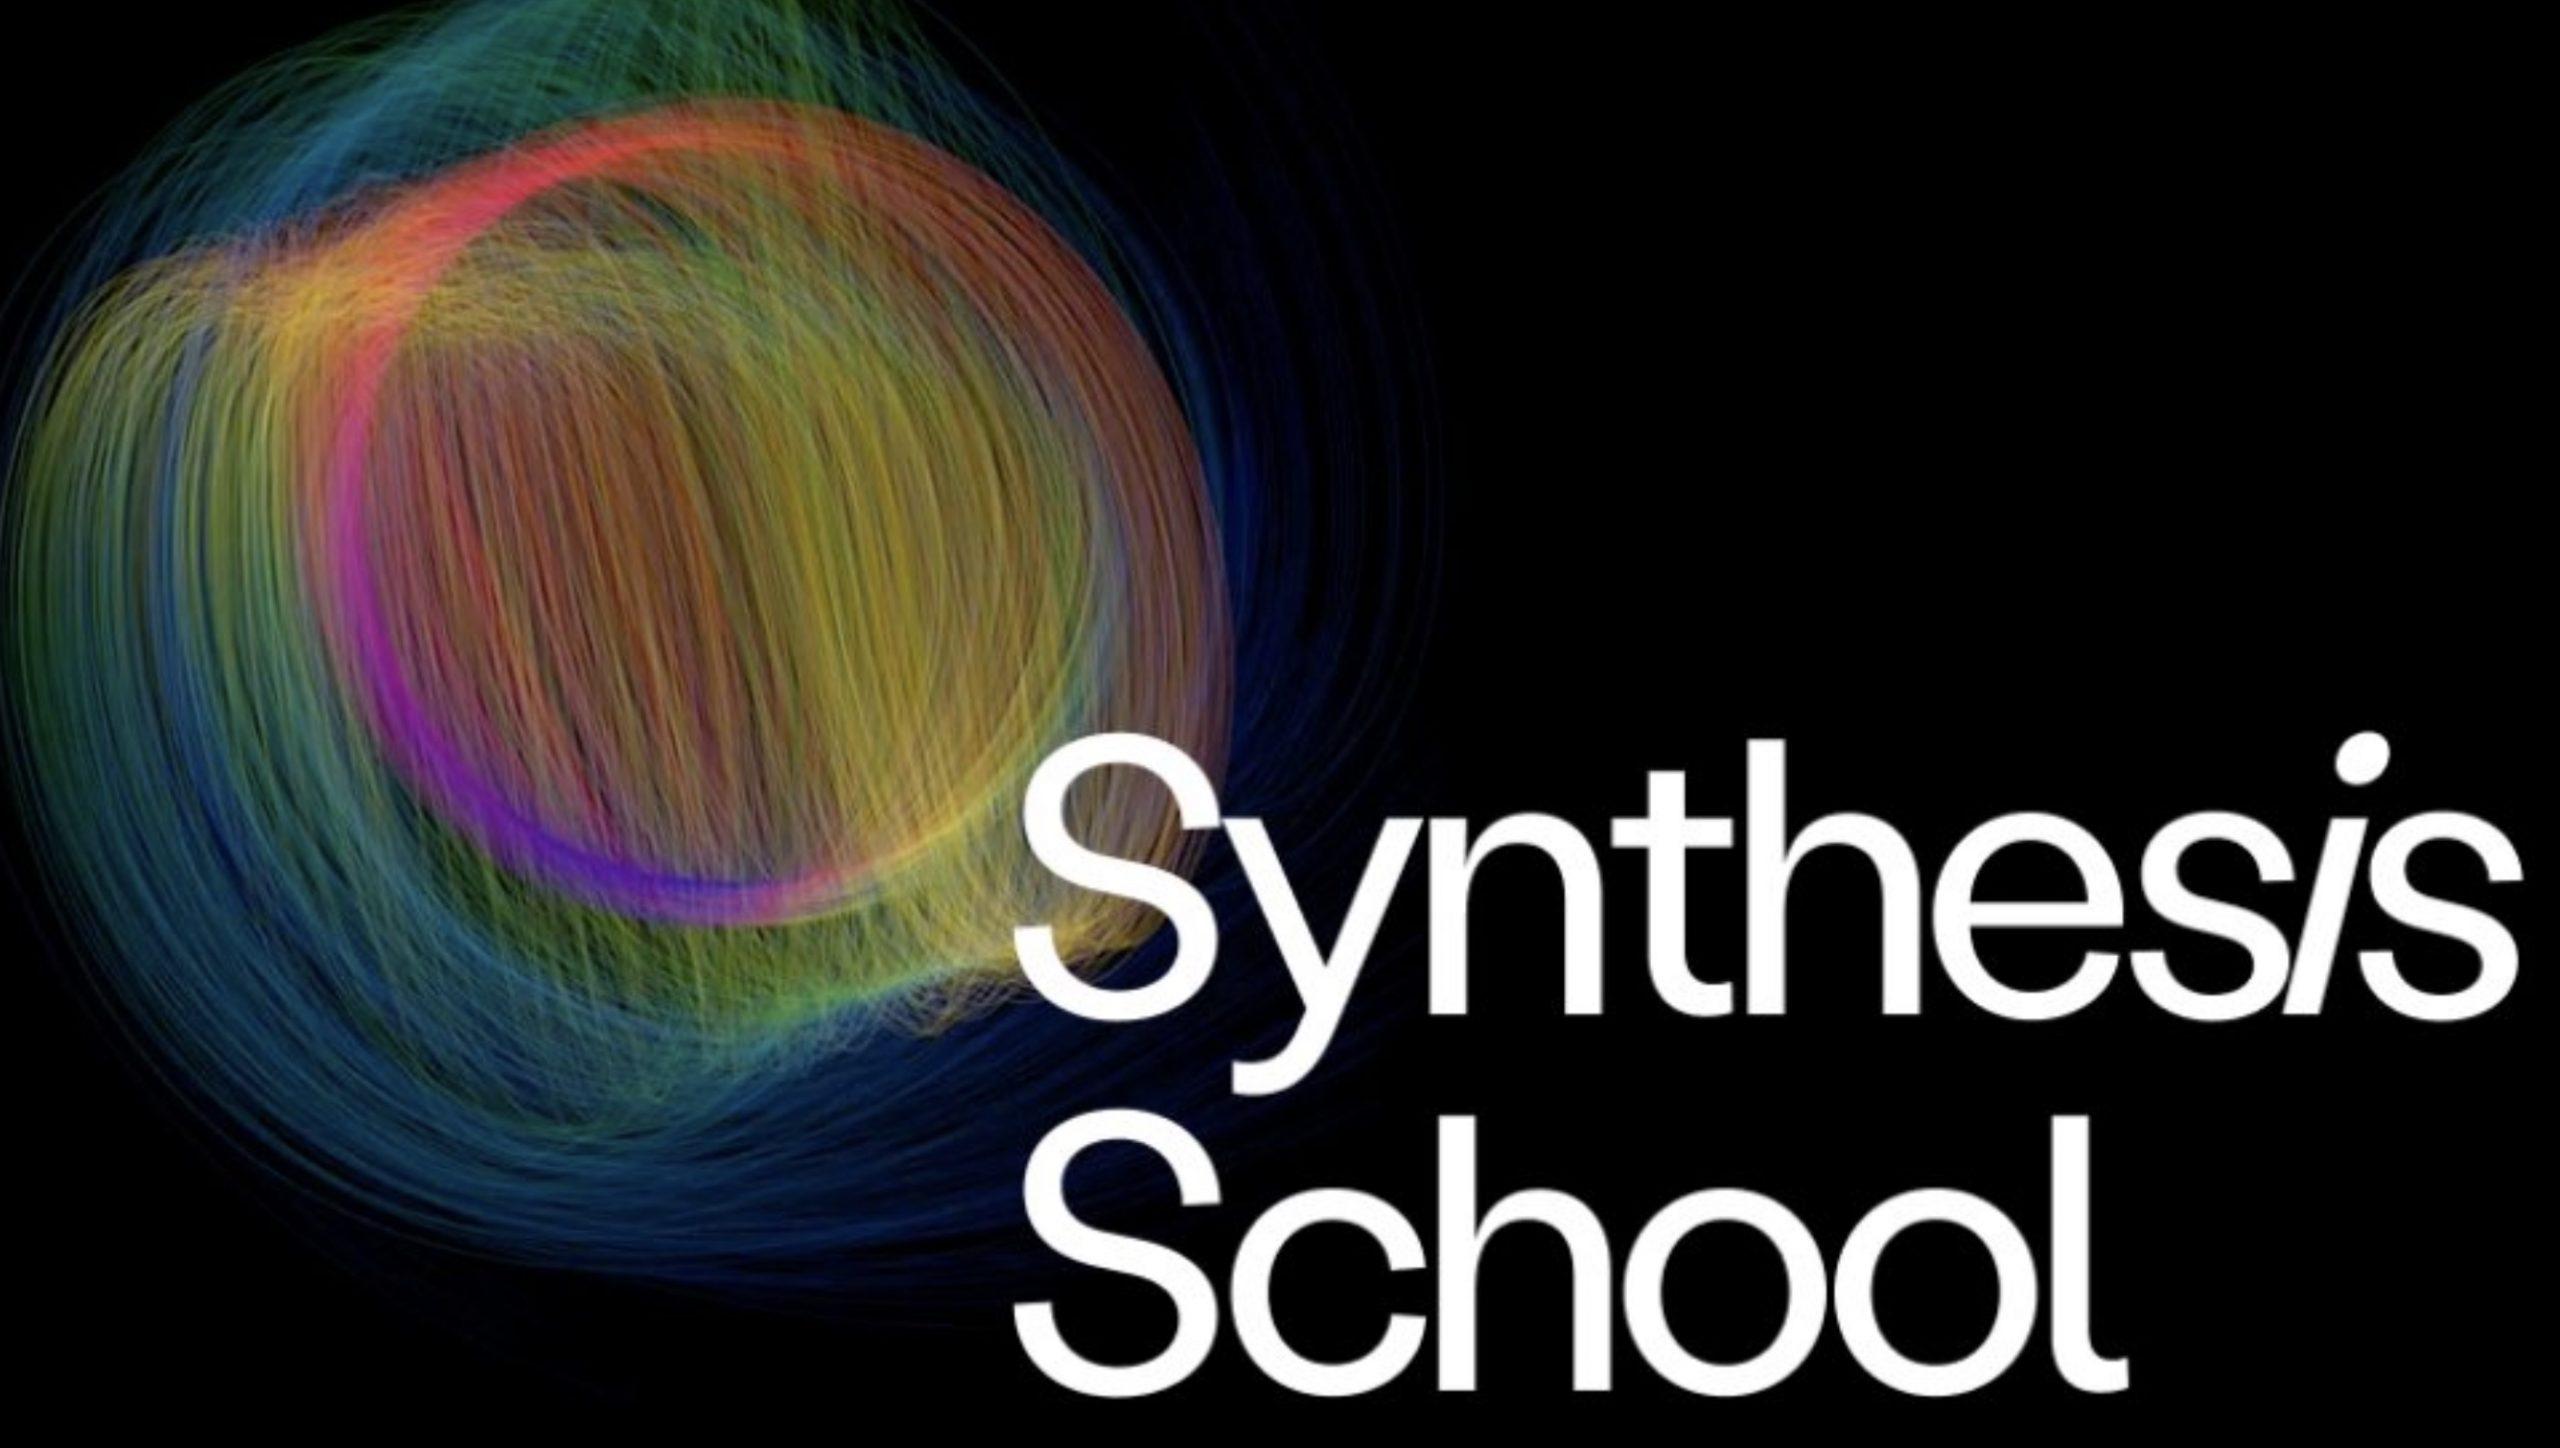 Elon-Musk-SpaceX-Lab-school-Sythesis